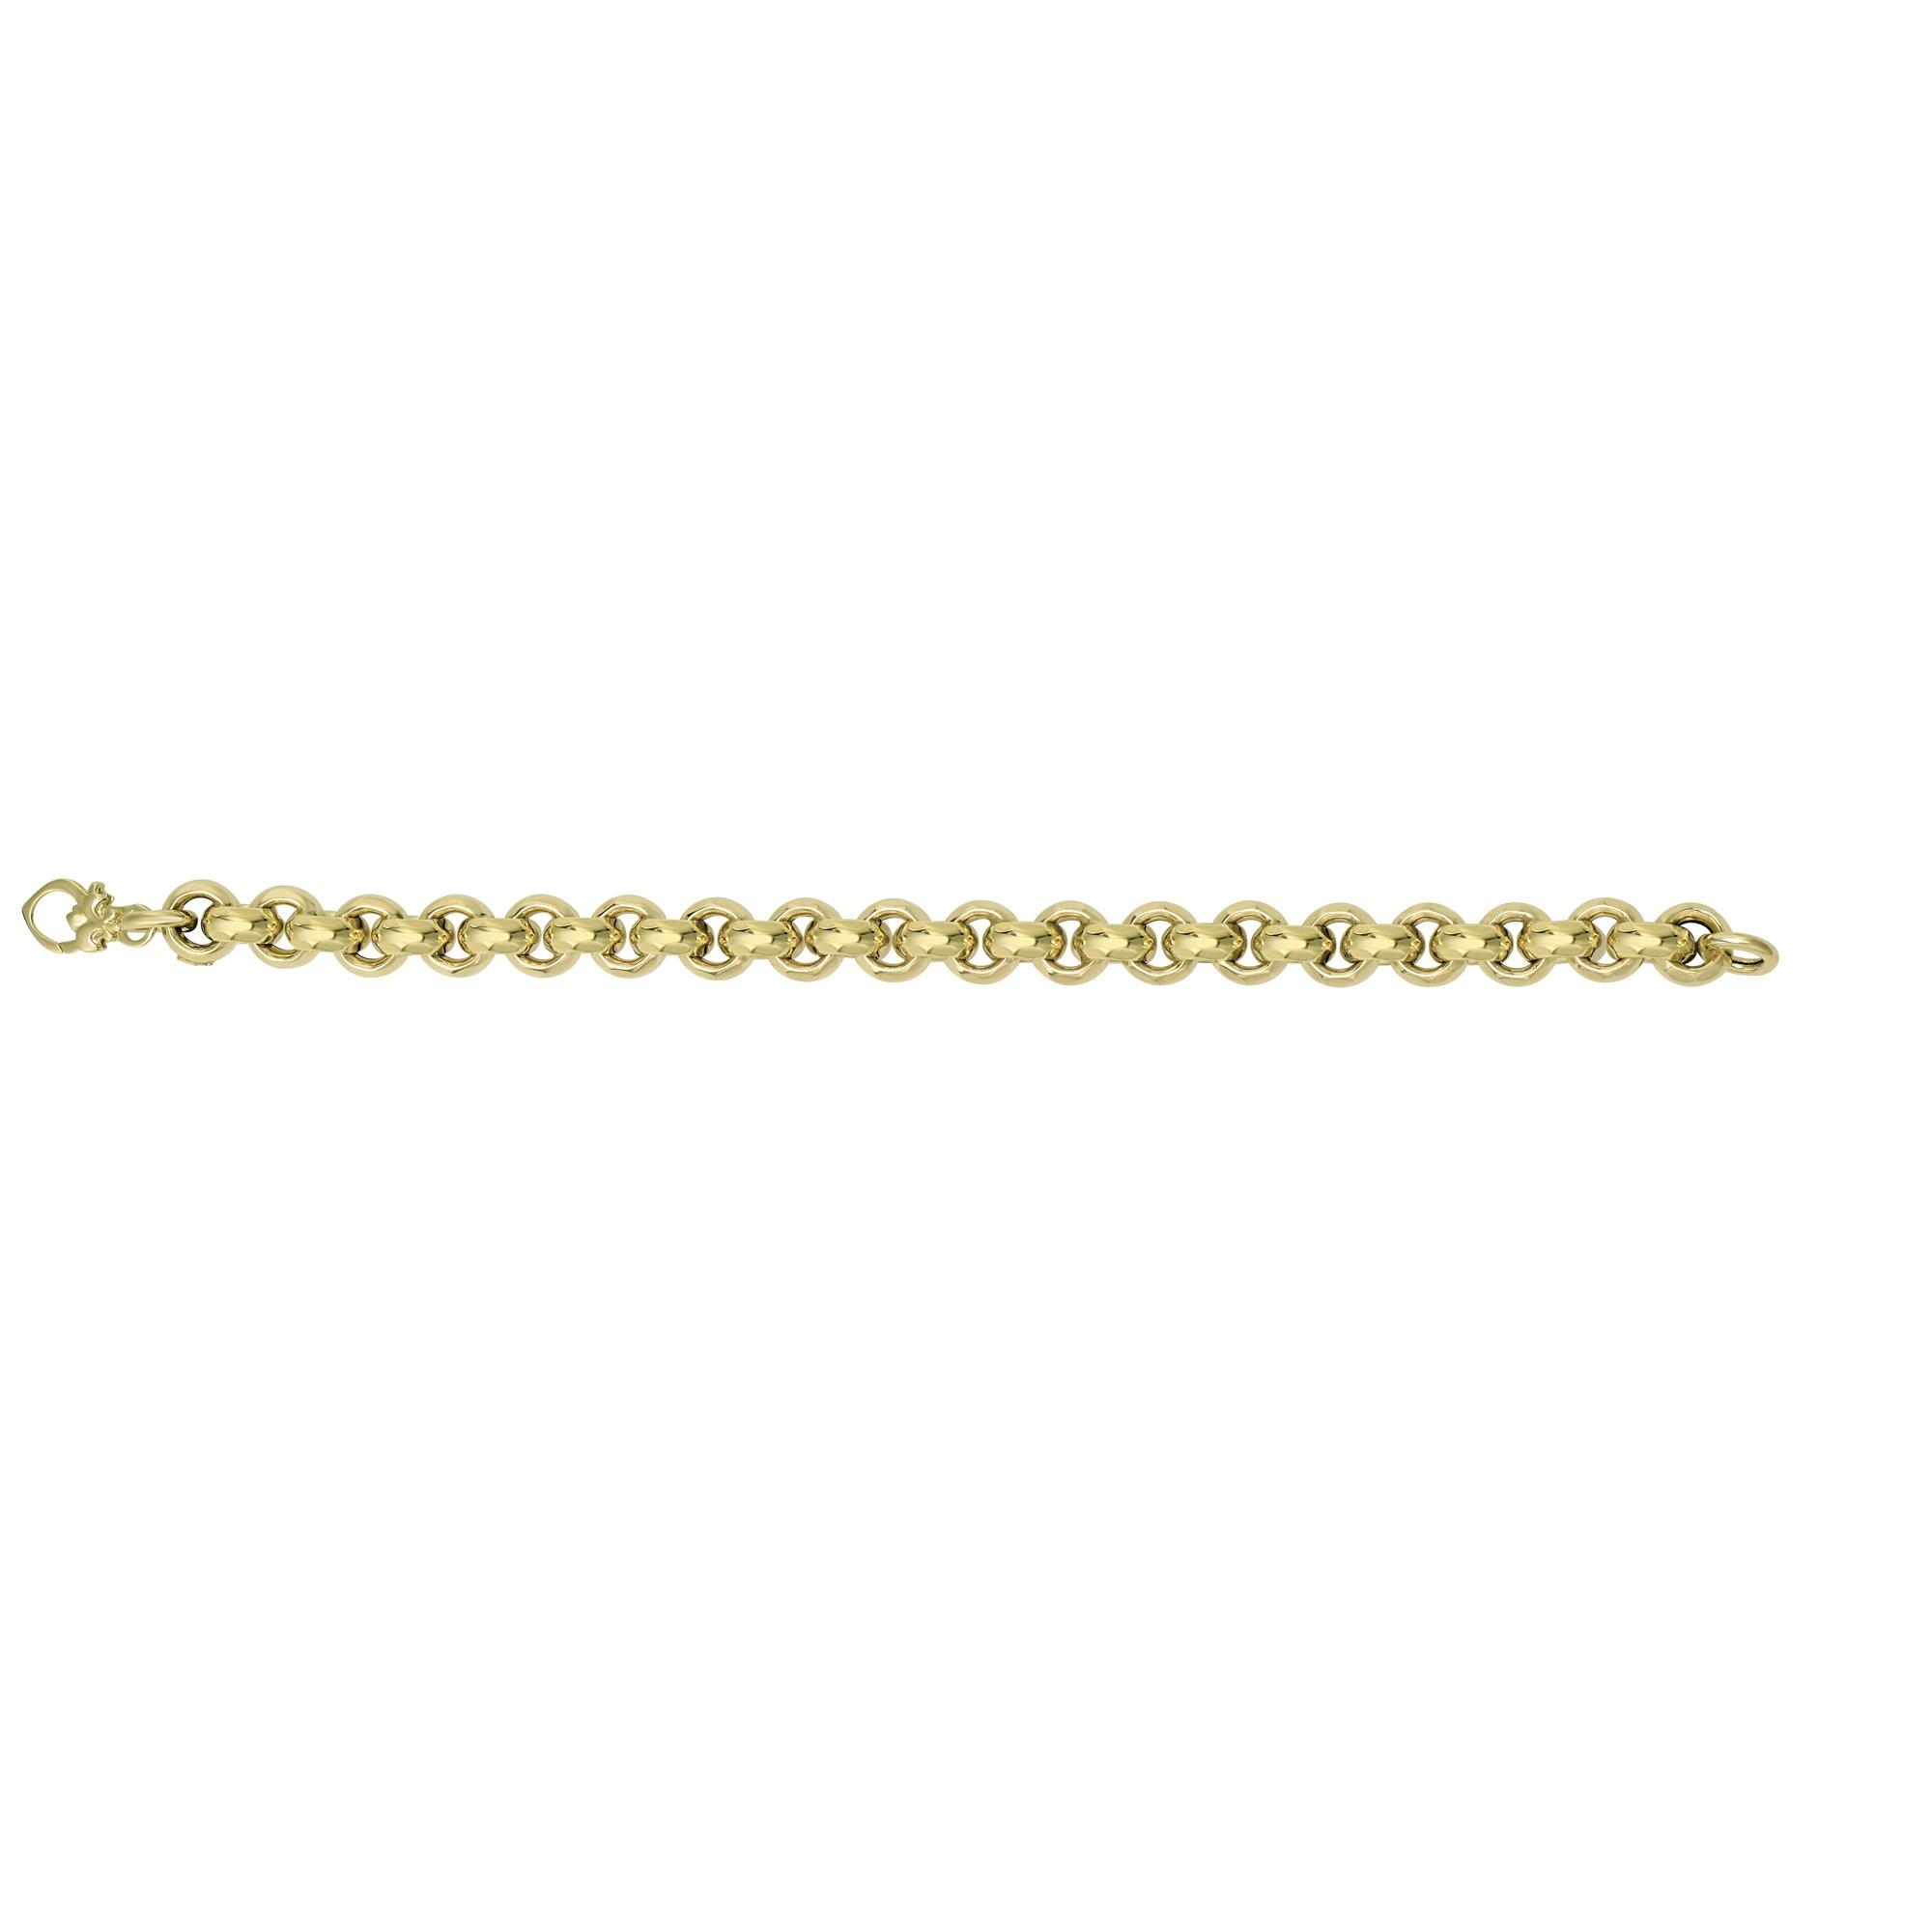 IcedTime 14K Yellow Gold Shiny Diamond Cut 9.5mm Round Rolo Type 8'' Bracelet with Fancy Fleur De Lis Clasp